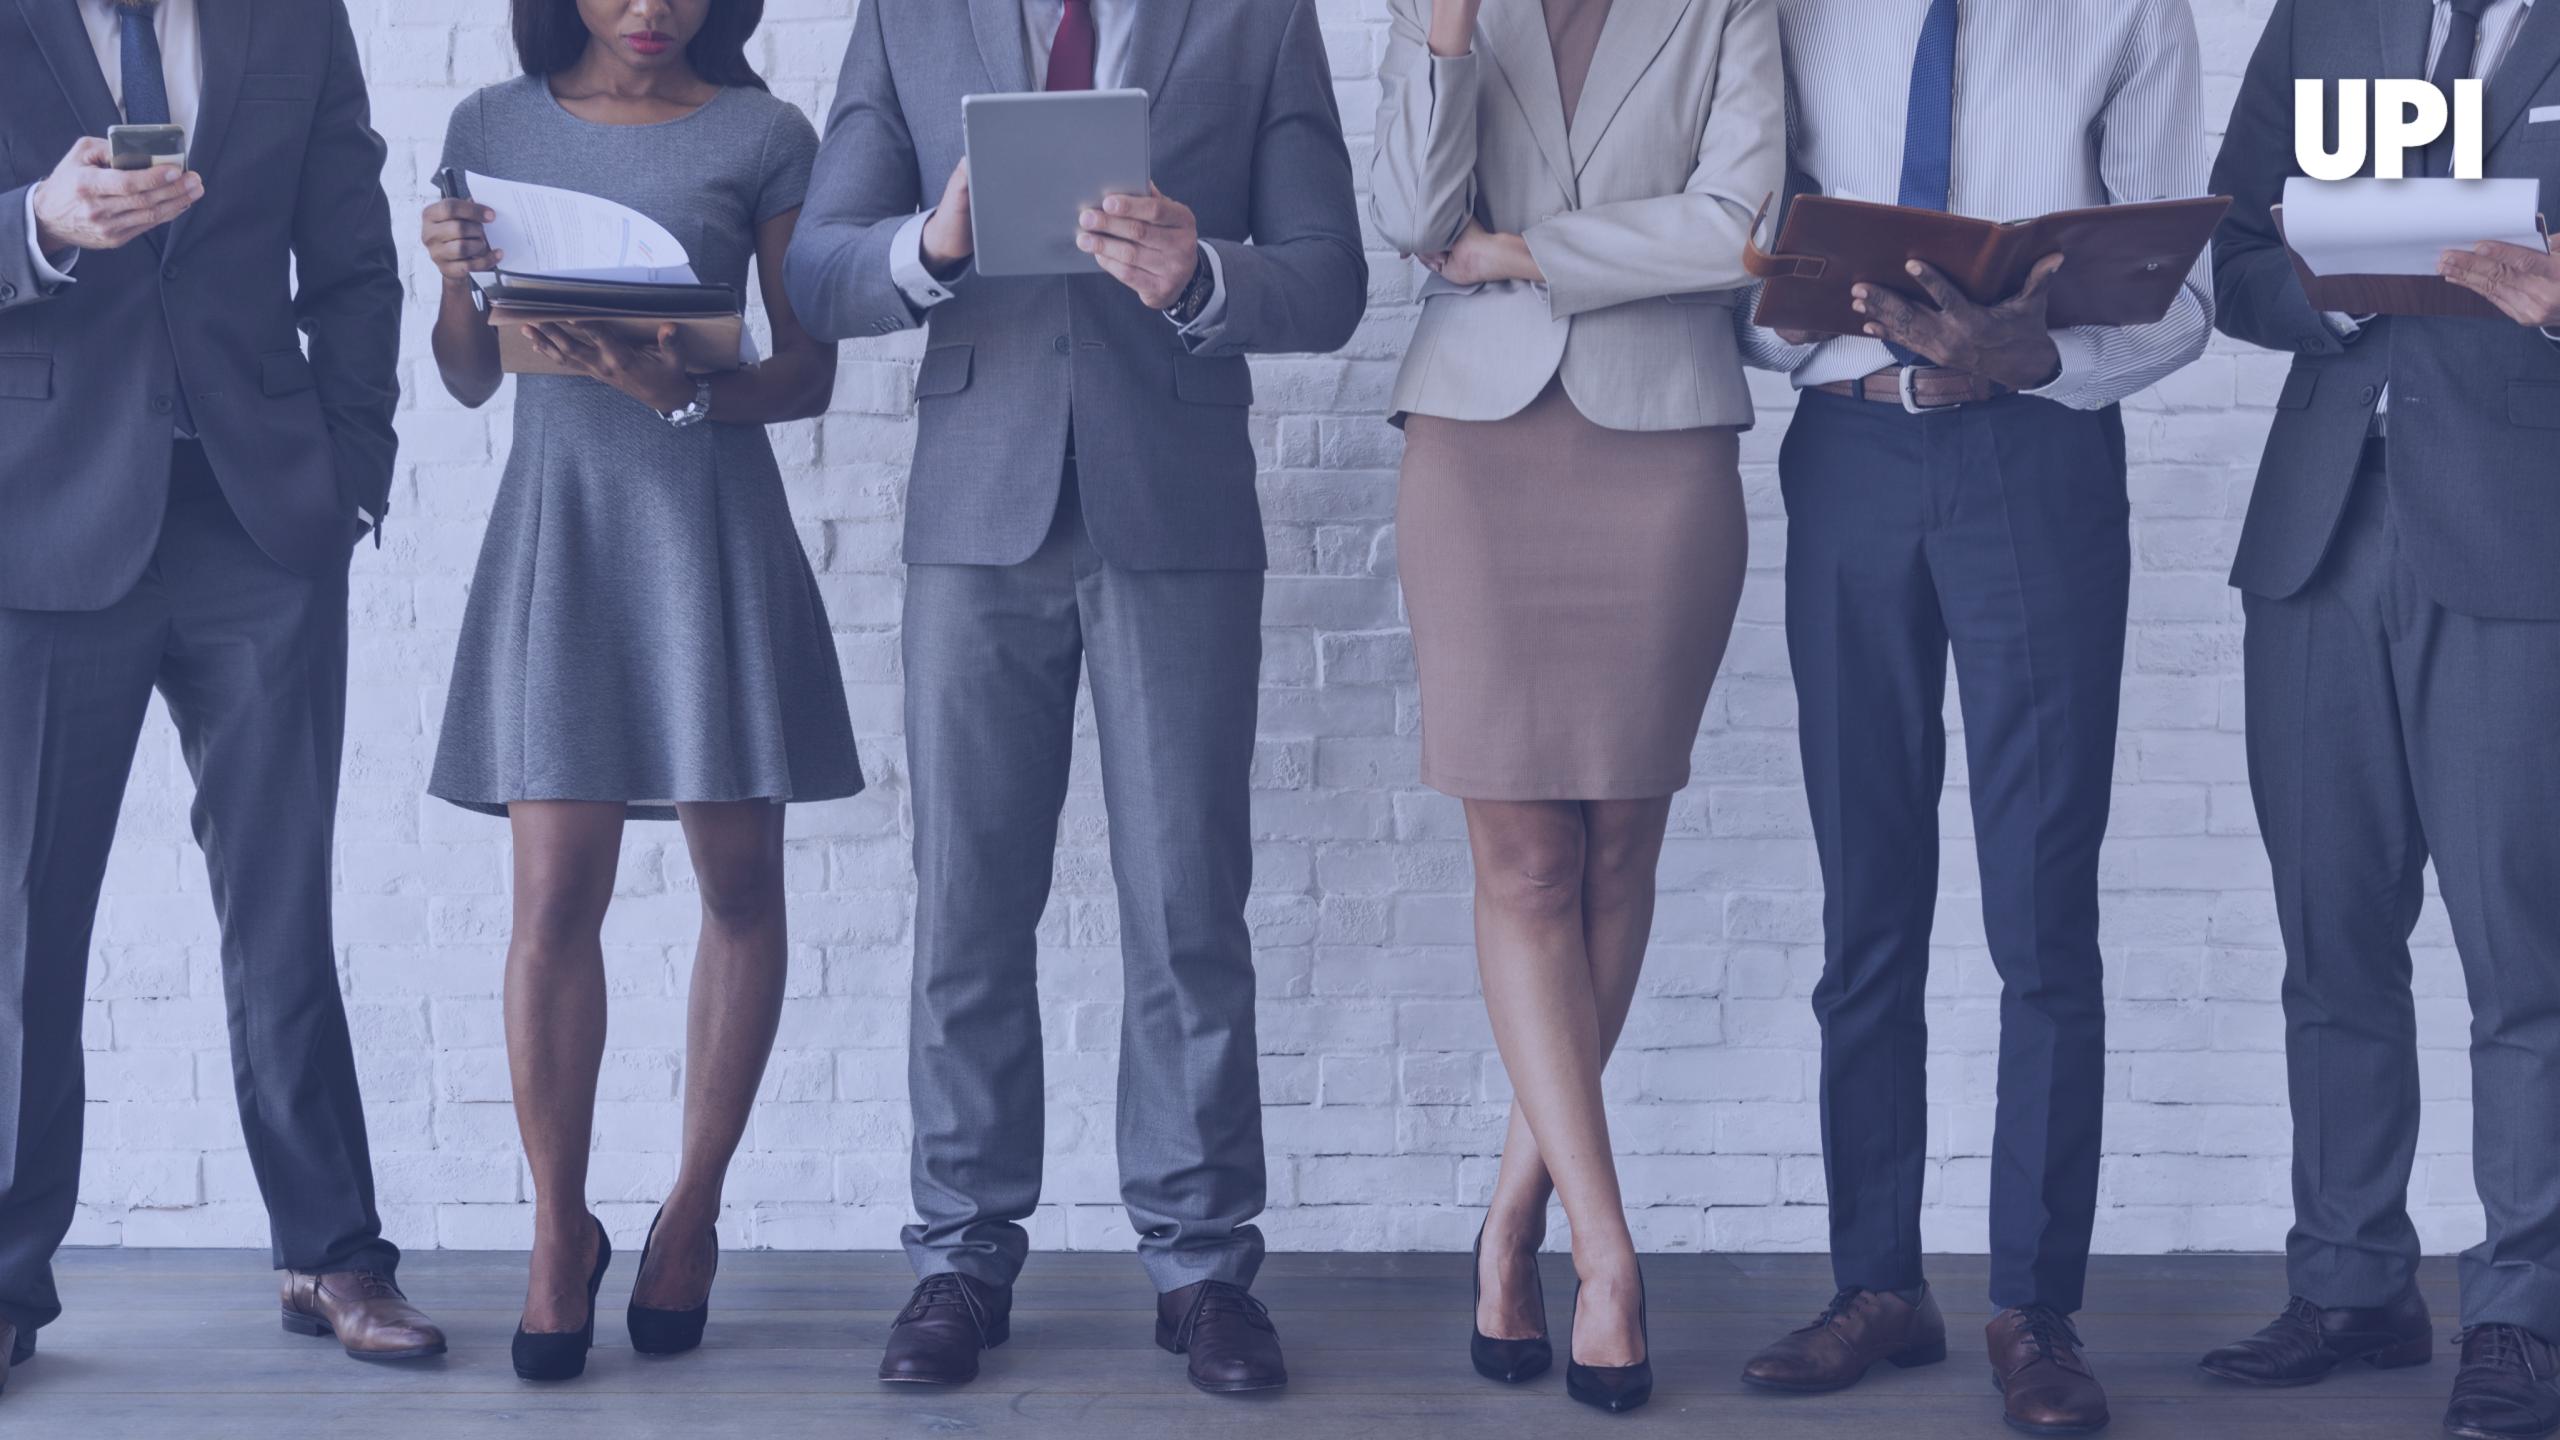 Workforce Needs Creative Solutions for 21st Century Economy